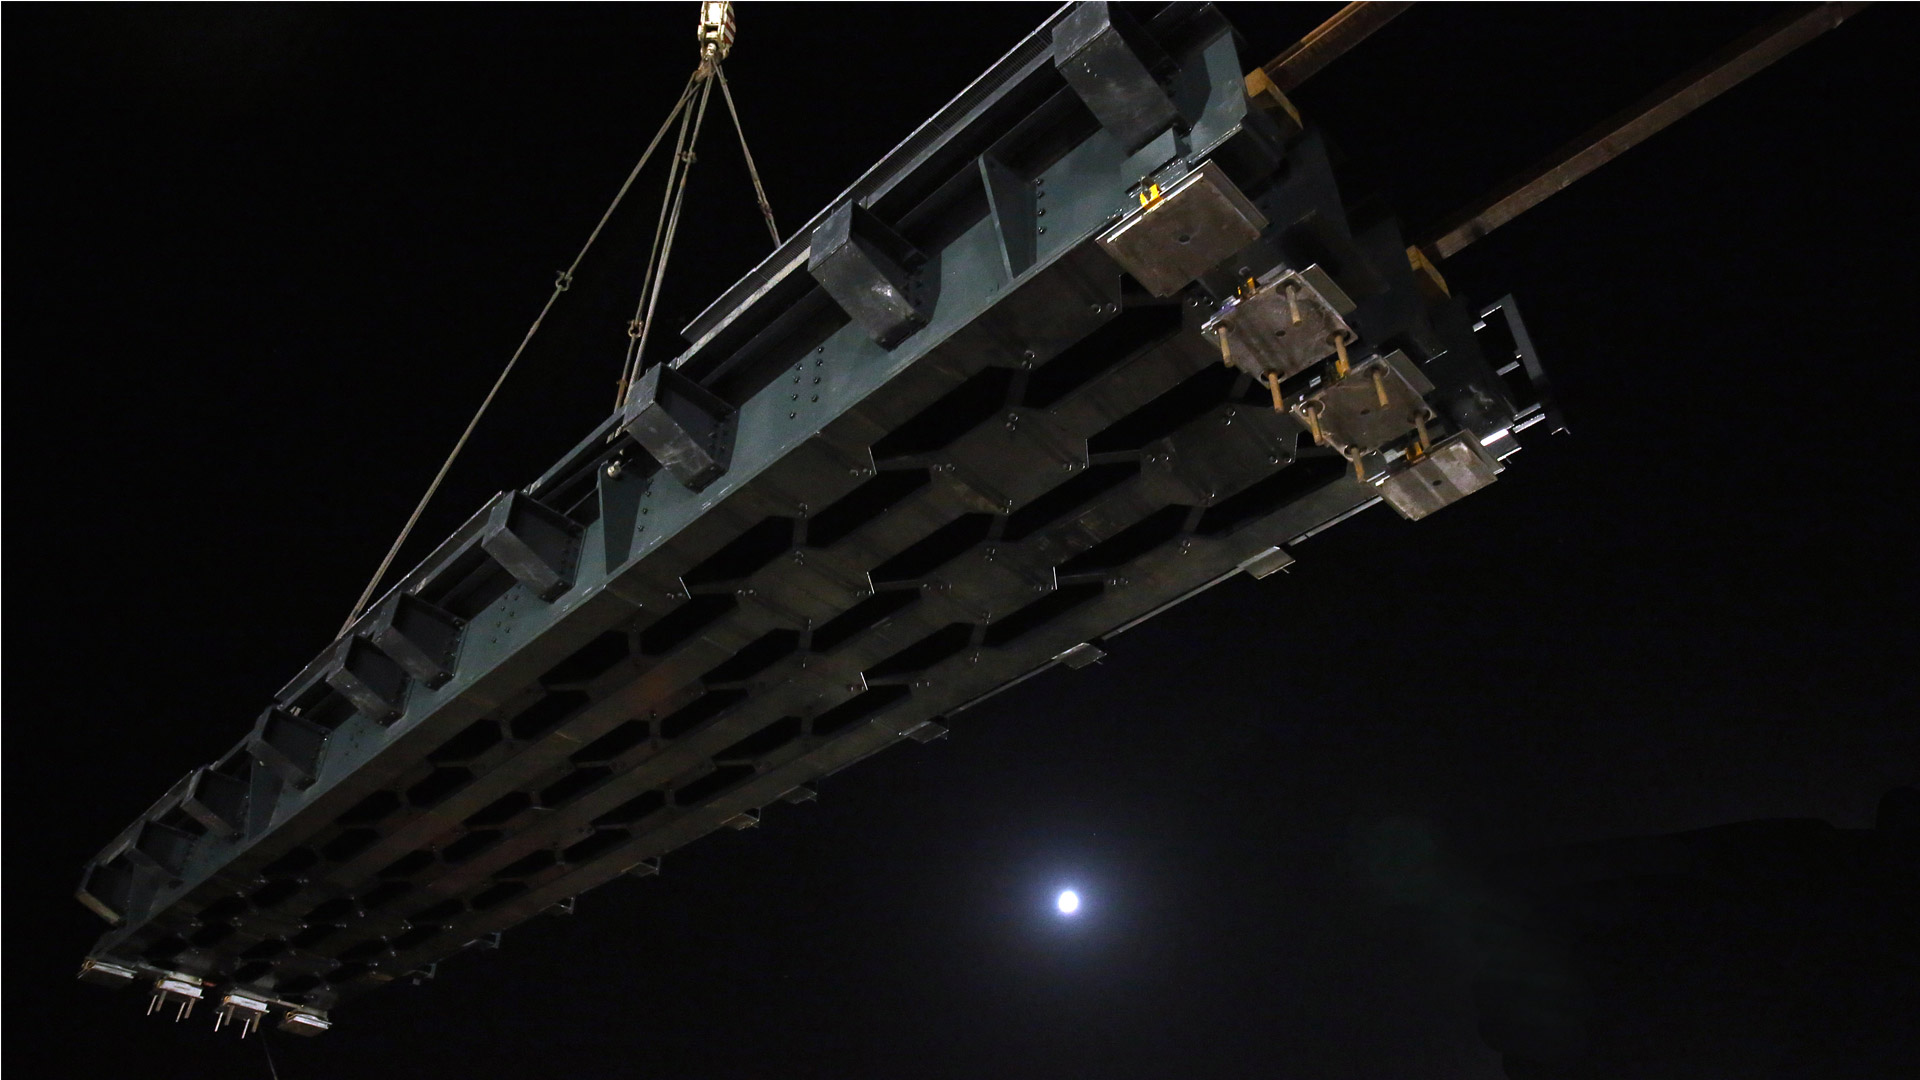 ponte-ferroviario-ninfa-sollevamento-metal-engineering-carpenteria-metallica-civile